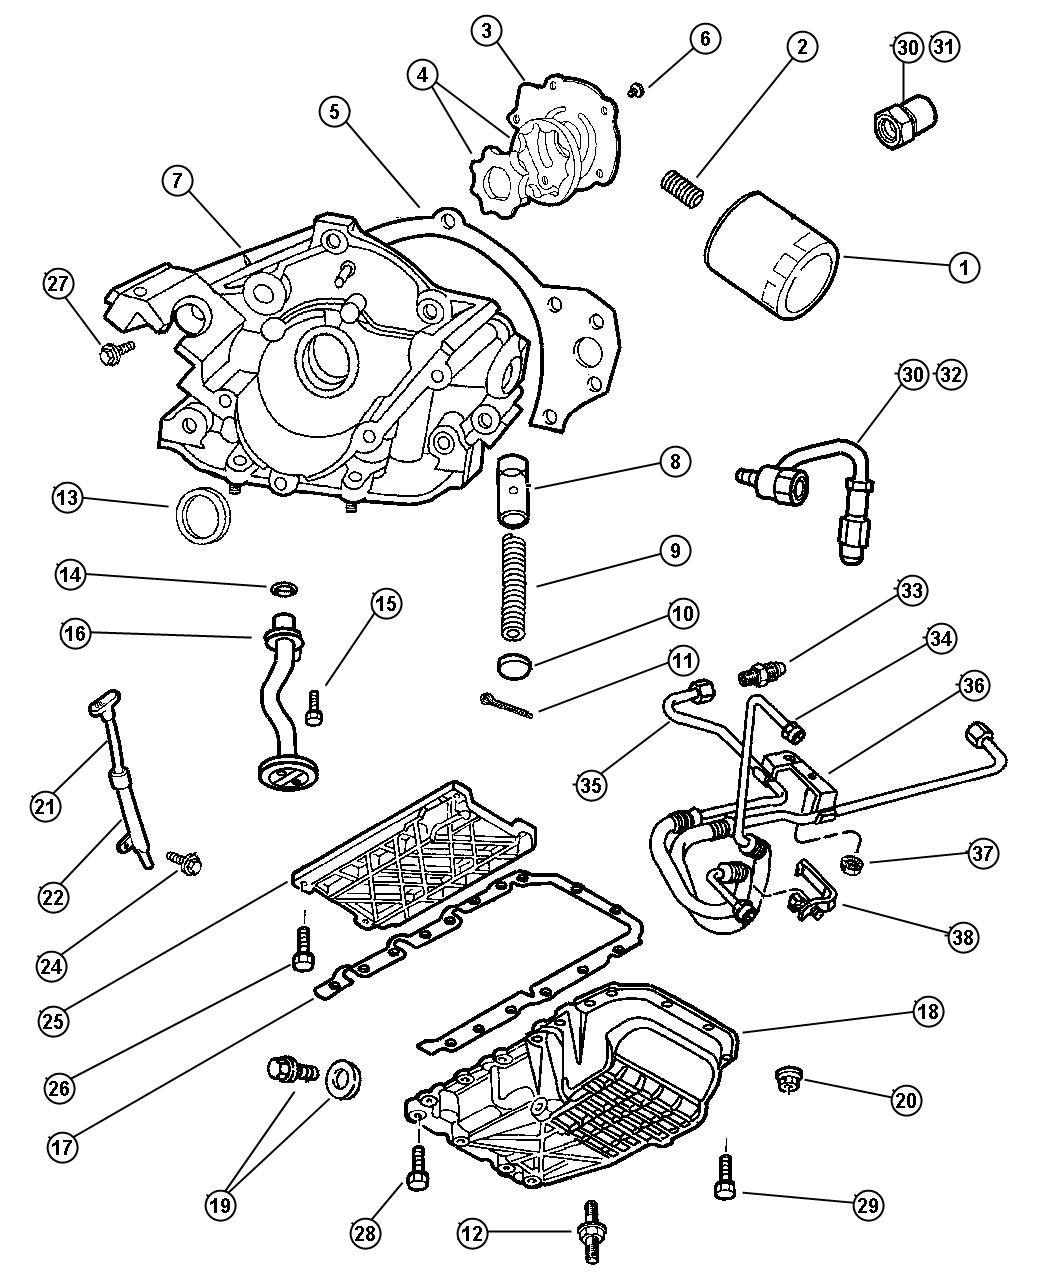 Dodge Intrepid Adapter Connector Oil Filter 3 4 16